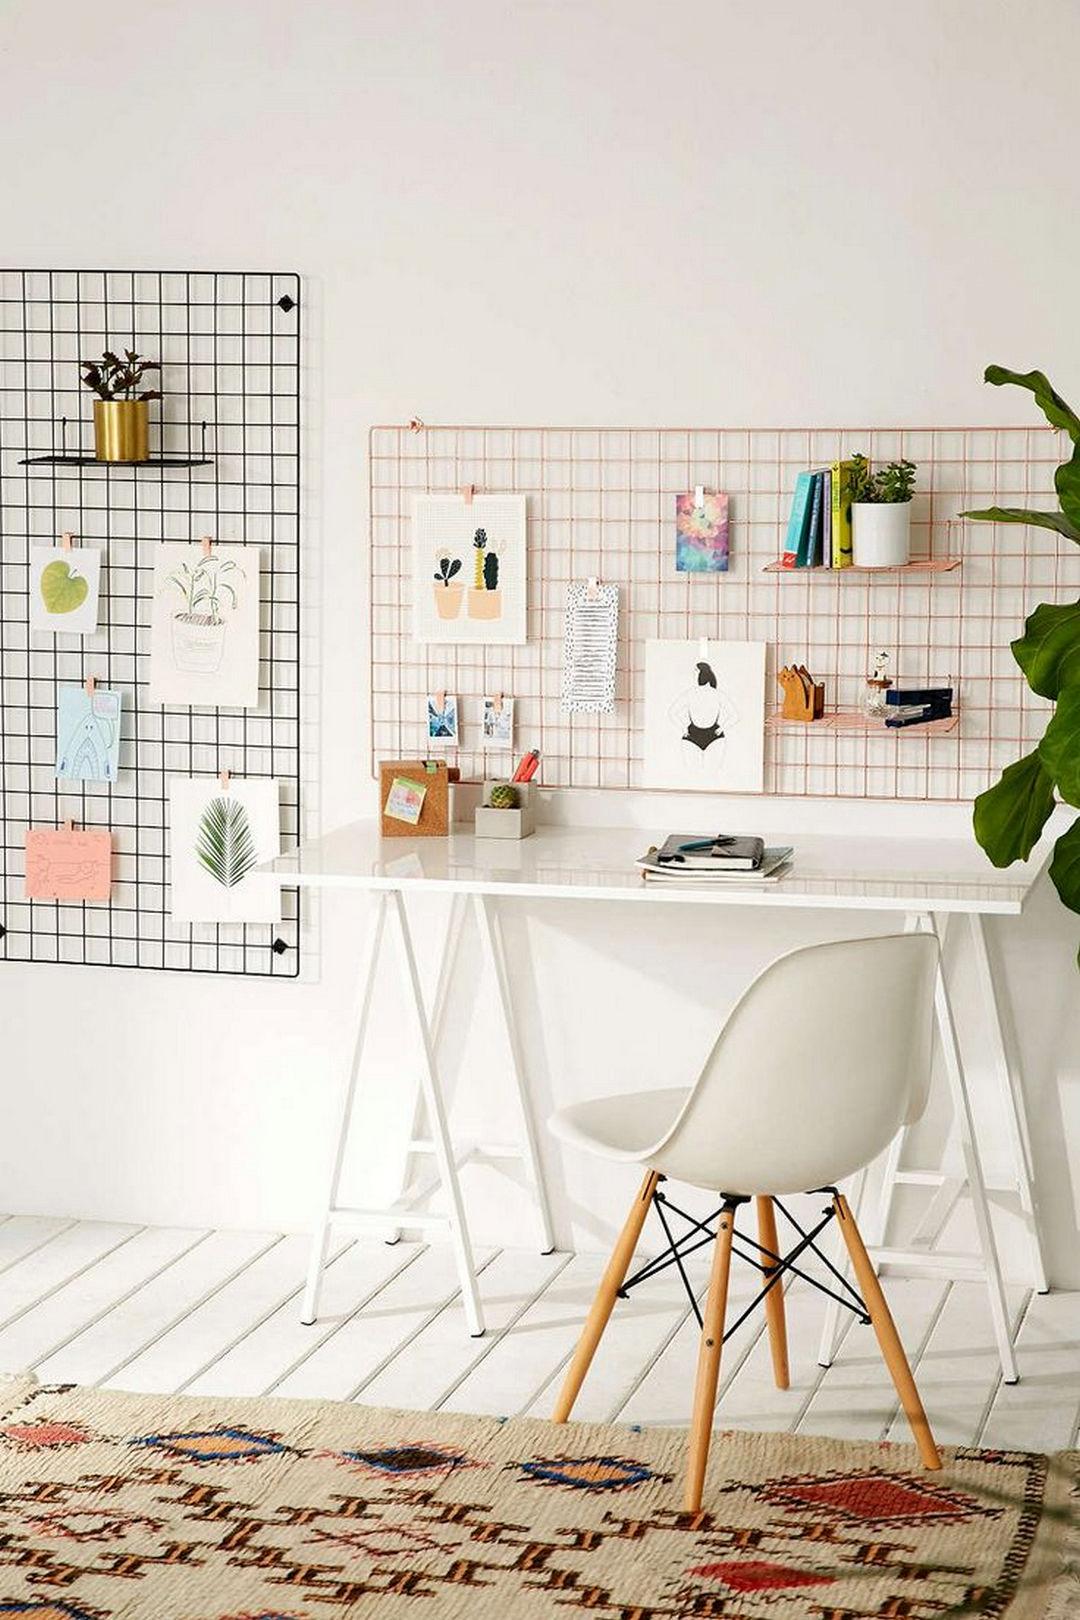 64 Contemporary Work Space Interior Designs | Contemporary, Spaces ...